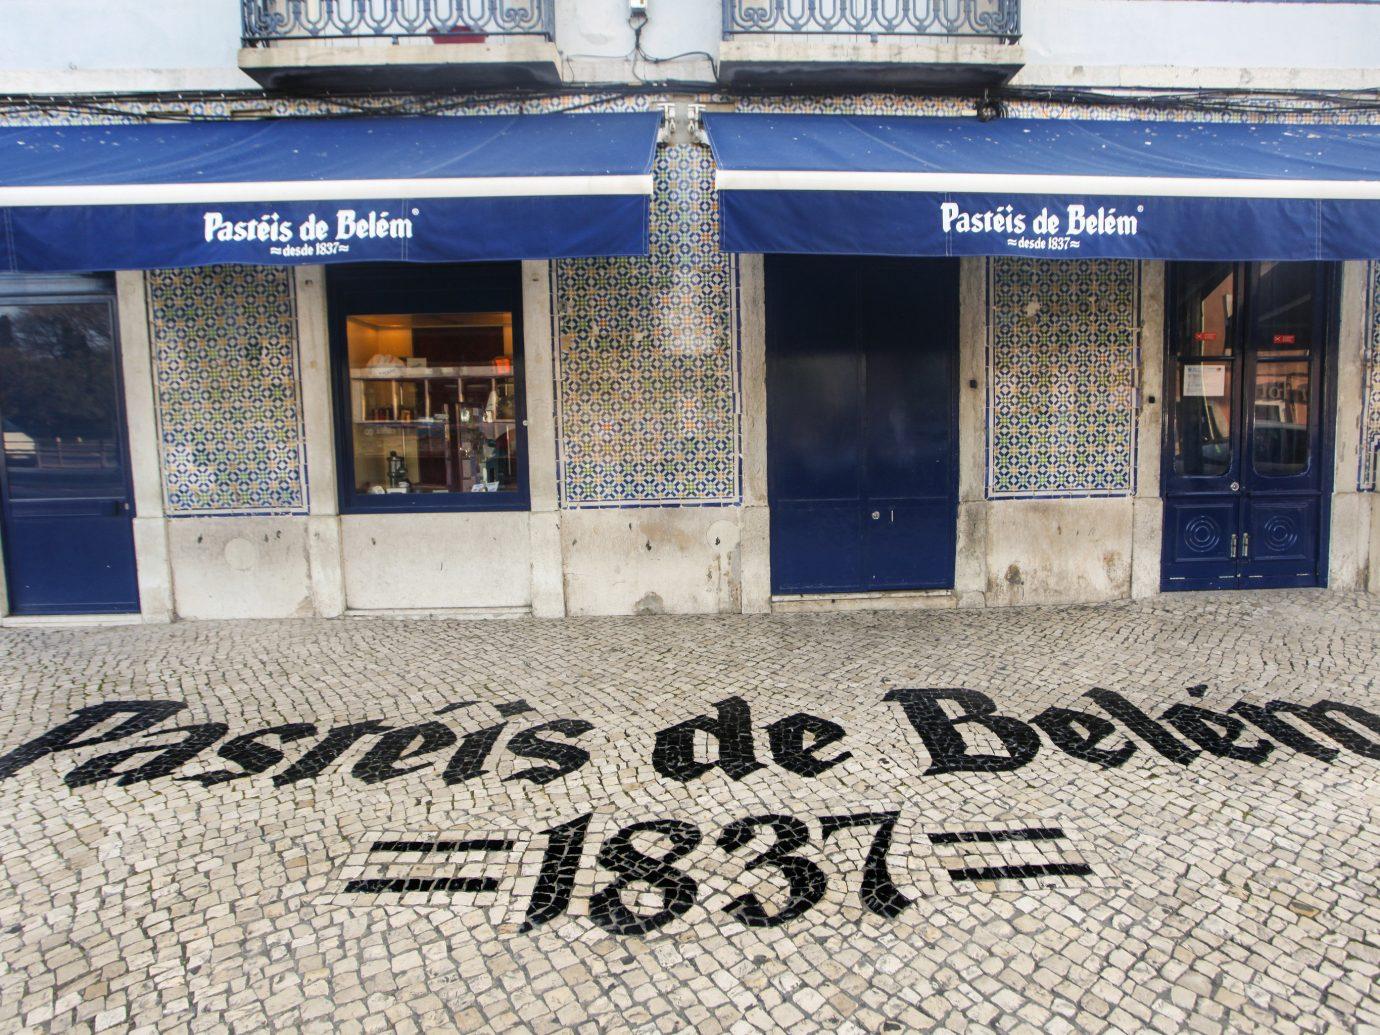 Lisbon Portugal Trip Ideas facade window building signage